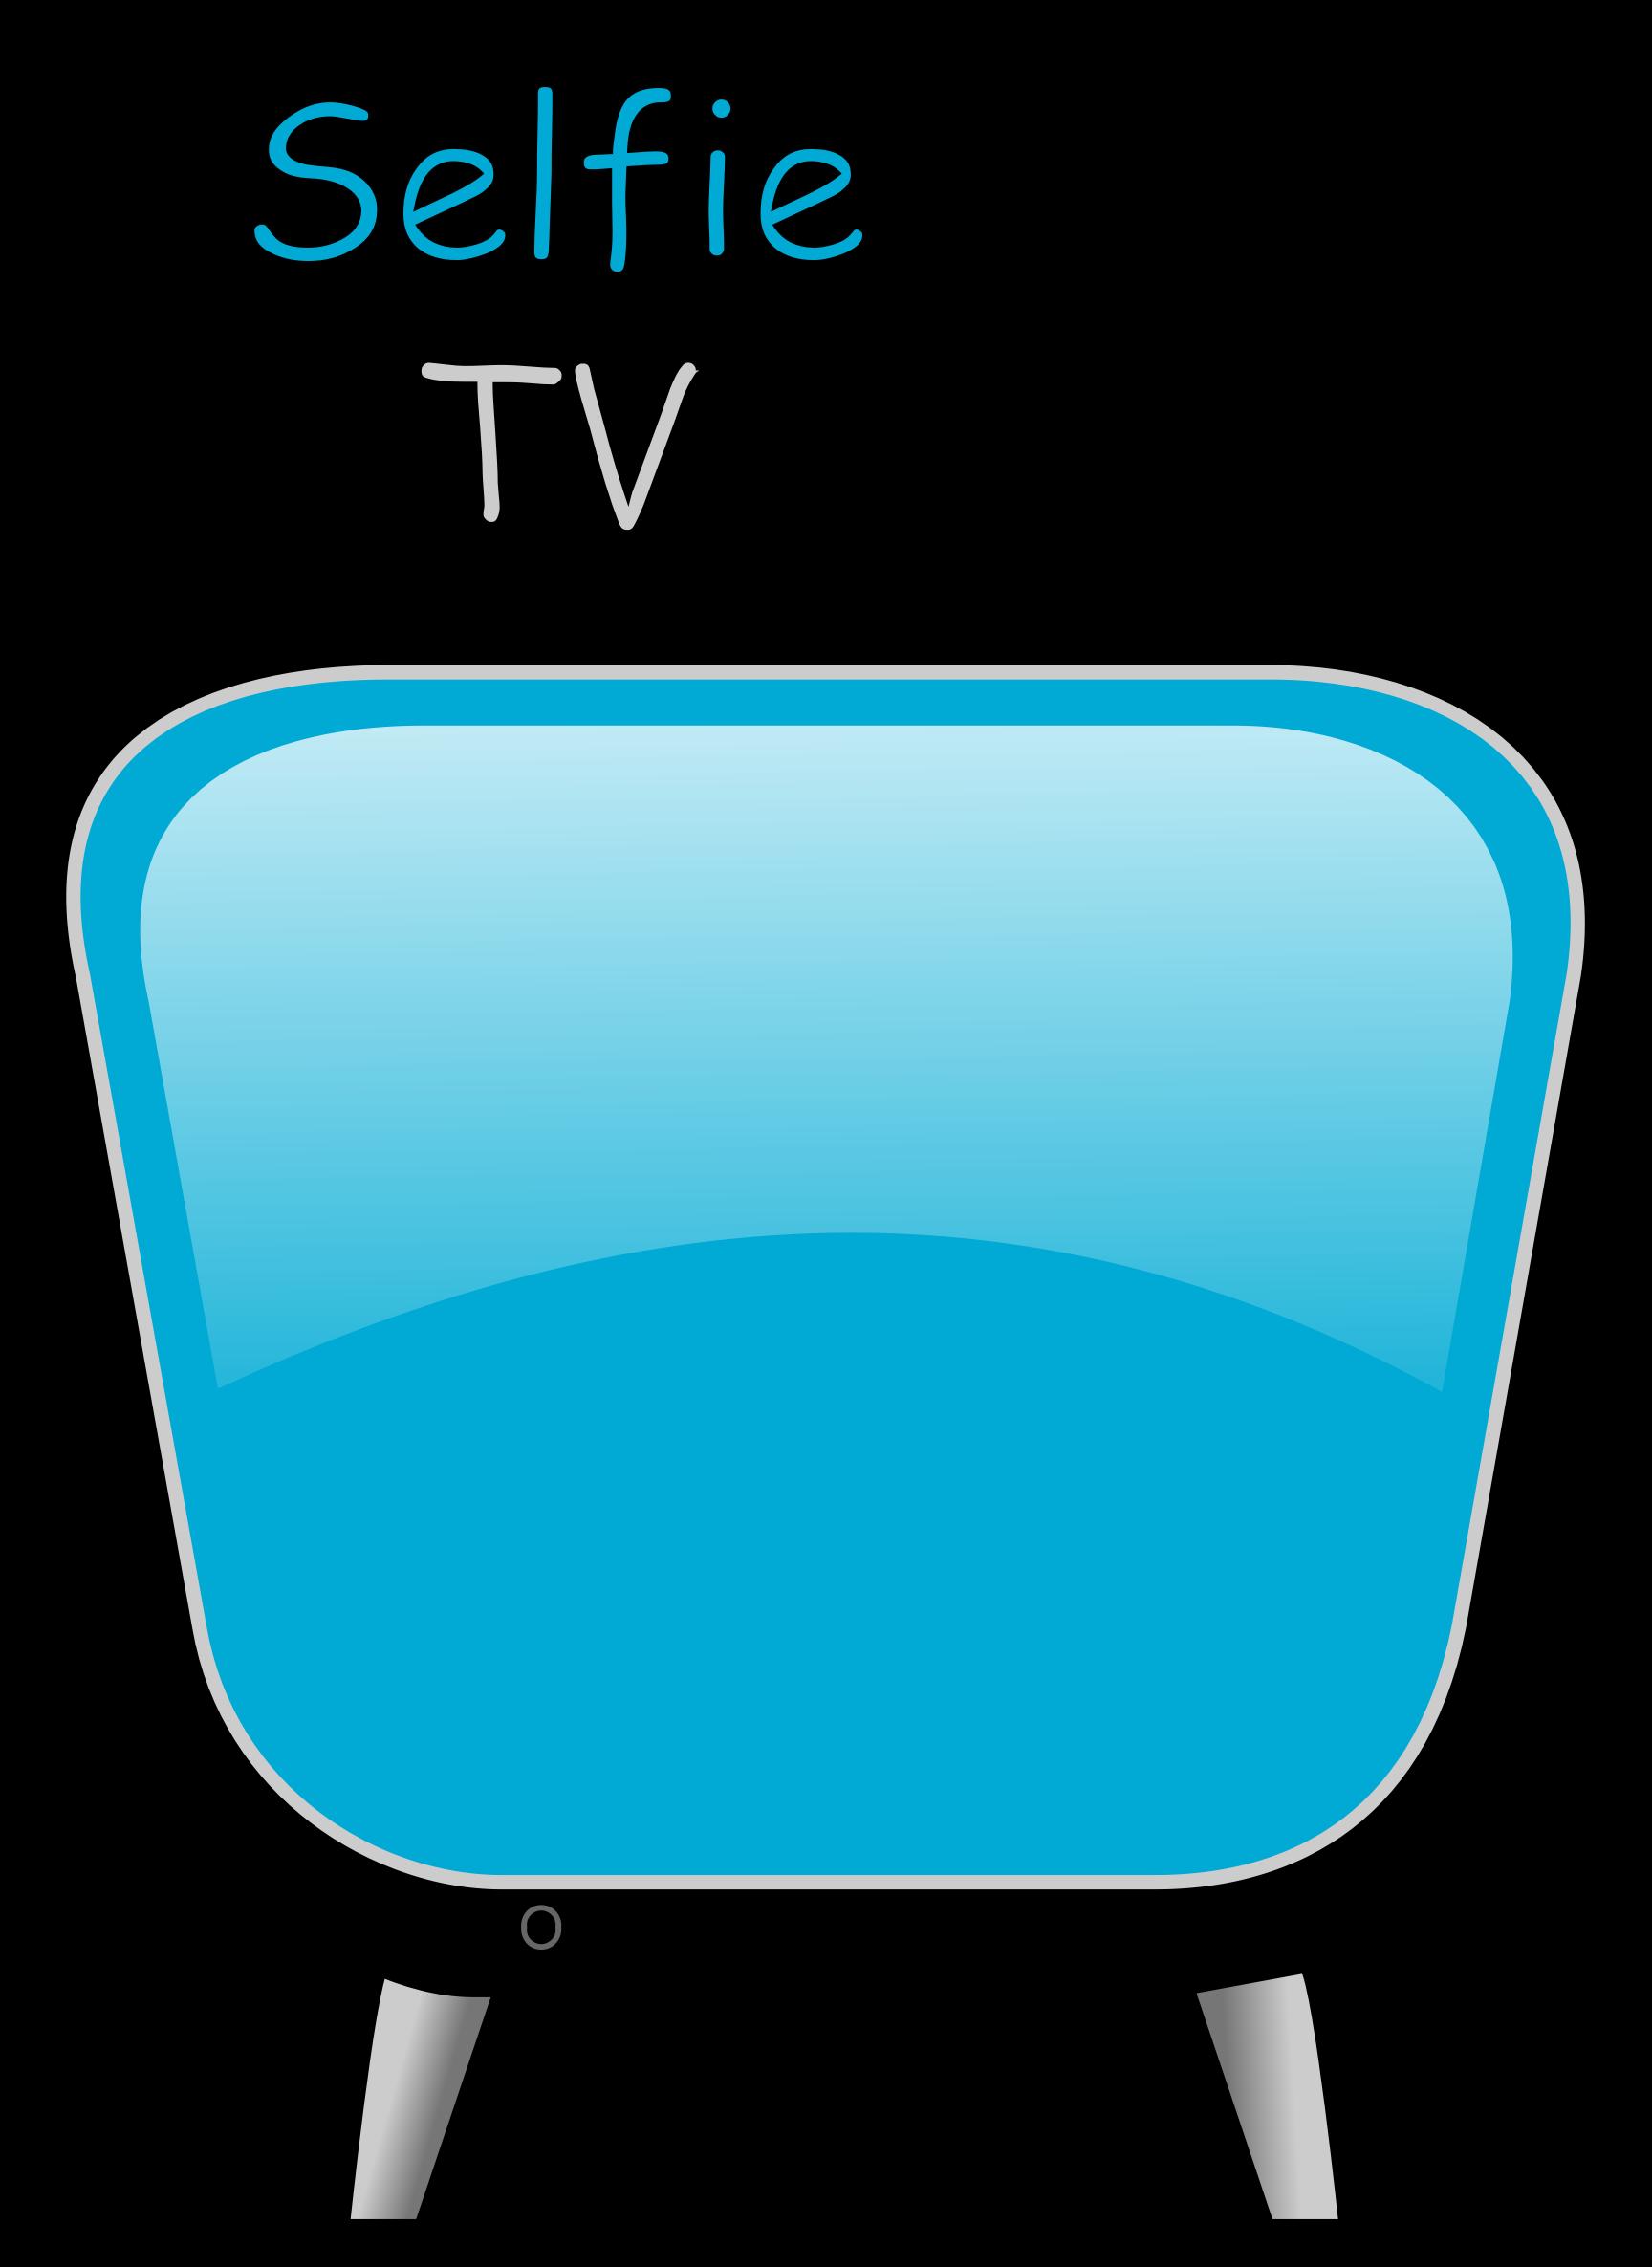 Television clipart television camera. Selfie tv big image